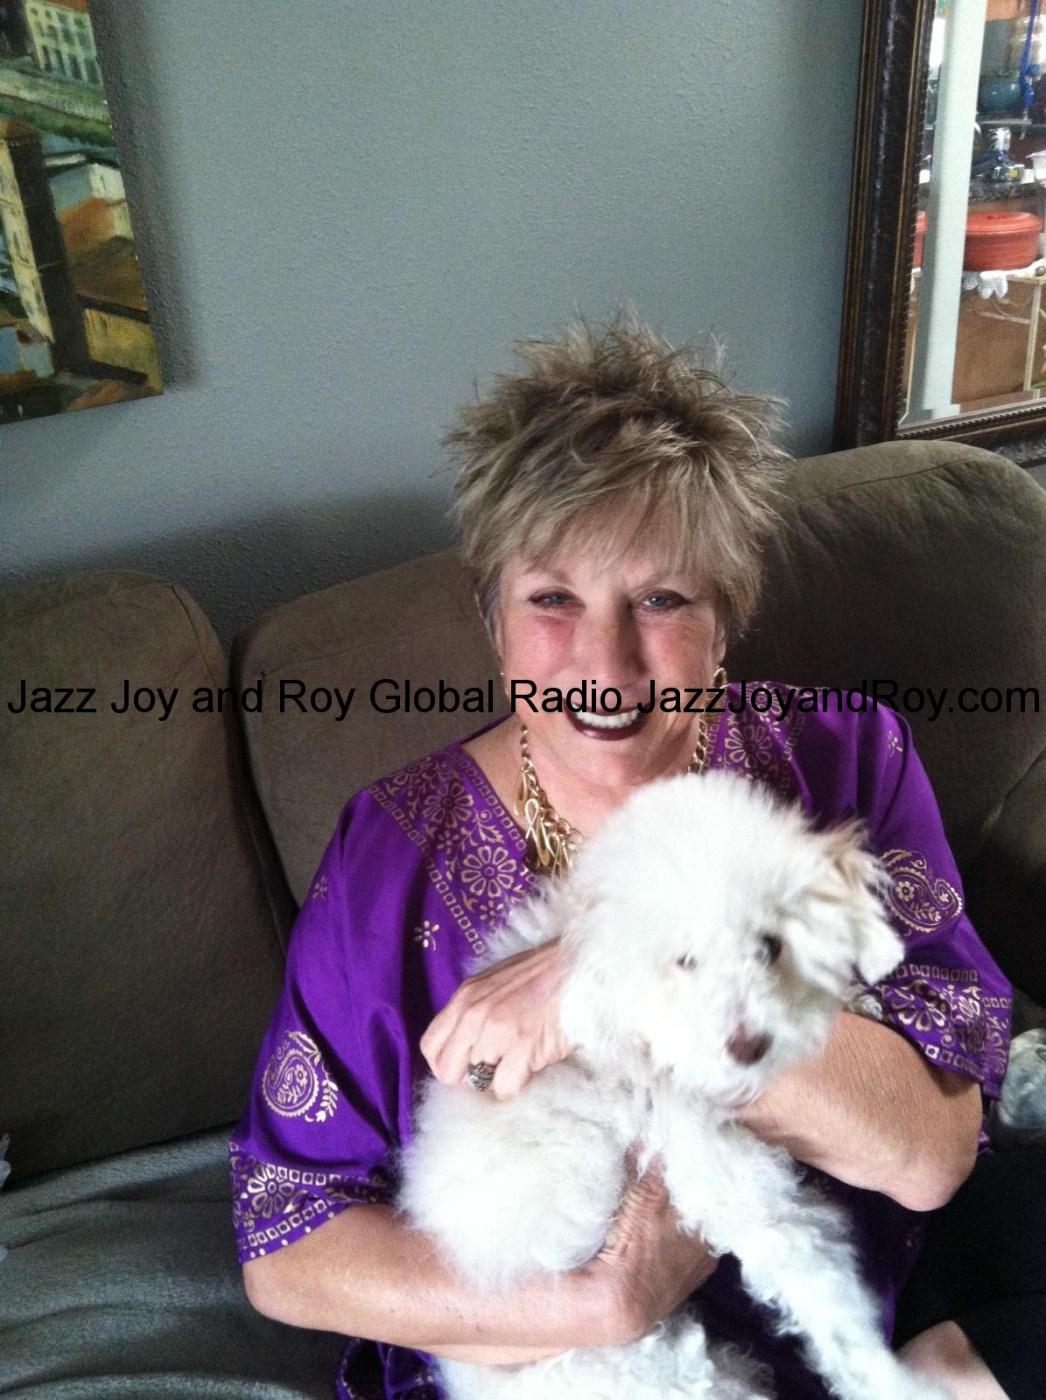 Beautiful Kathy with the family dog. Kathy's hubby Roy loves how Sylvana styles Kathy's hair